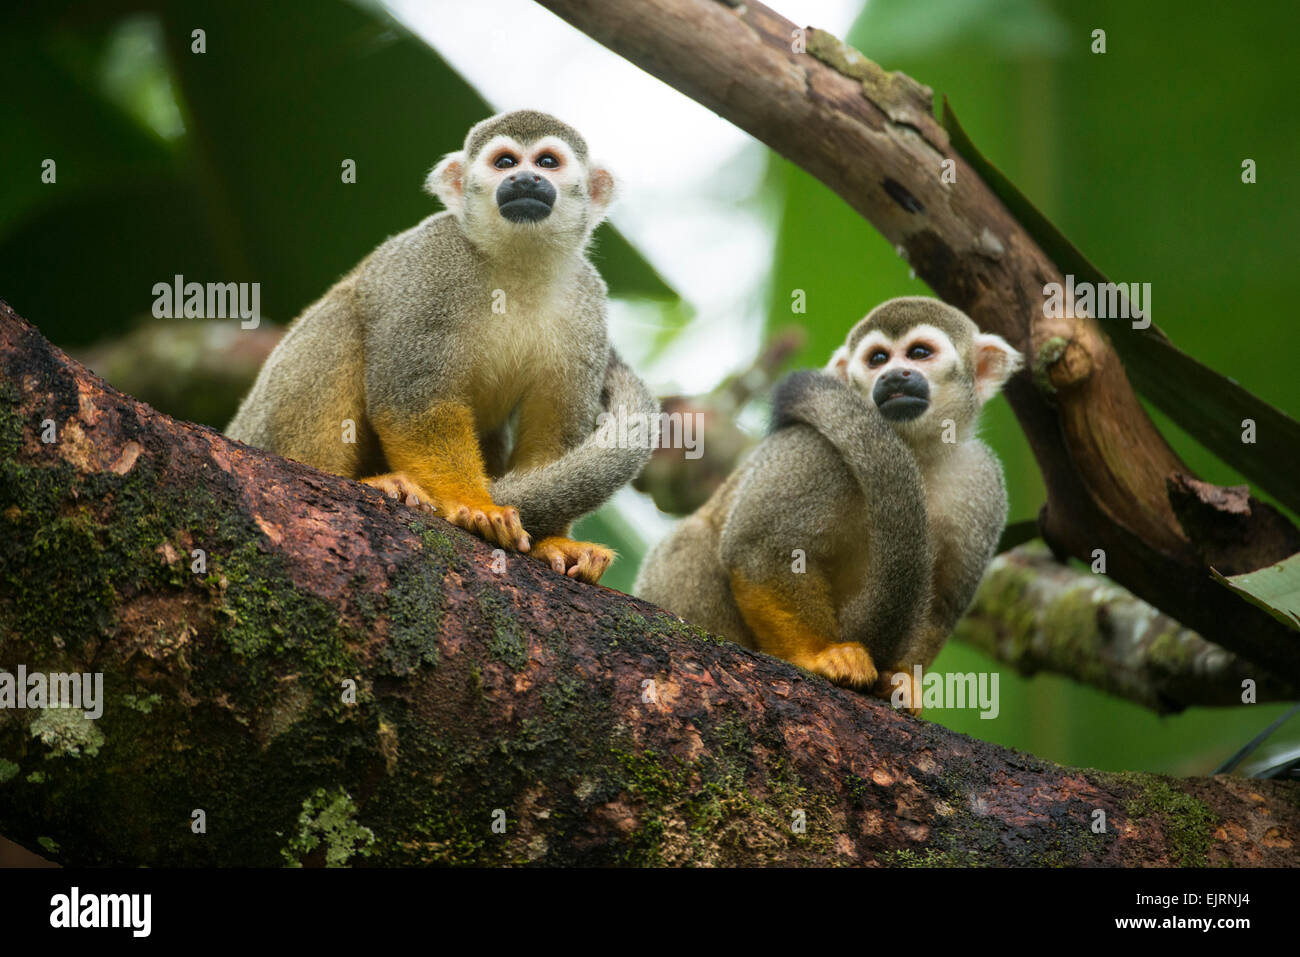 Squirrel monkeys, Saimiri, Central Suriname Nature Reserve, Suriname - Stock Image